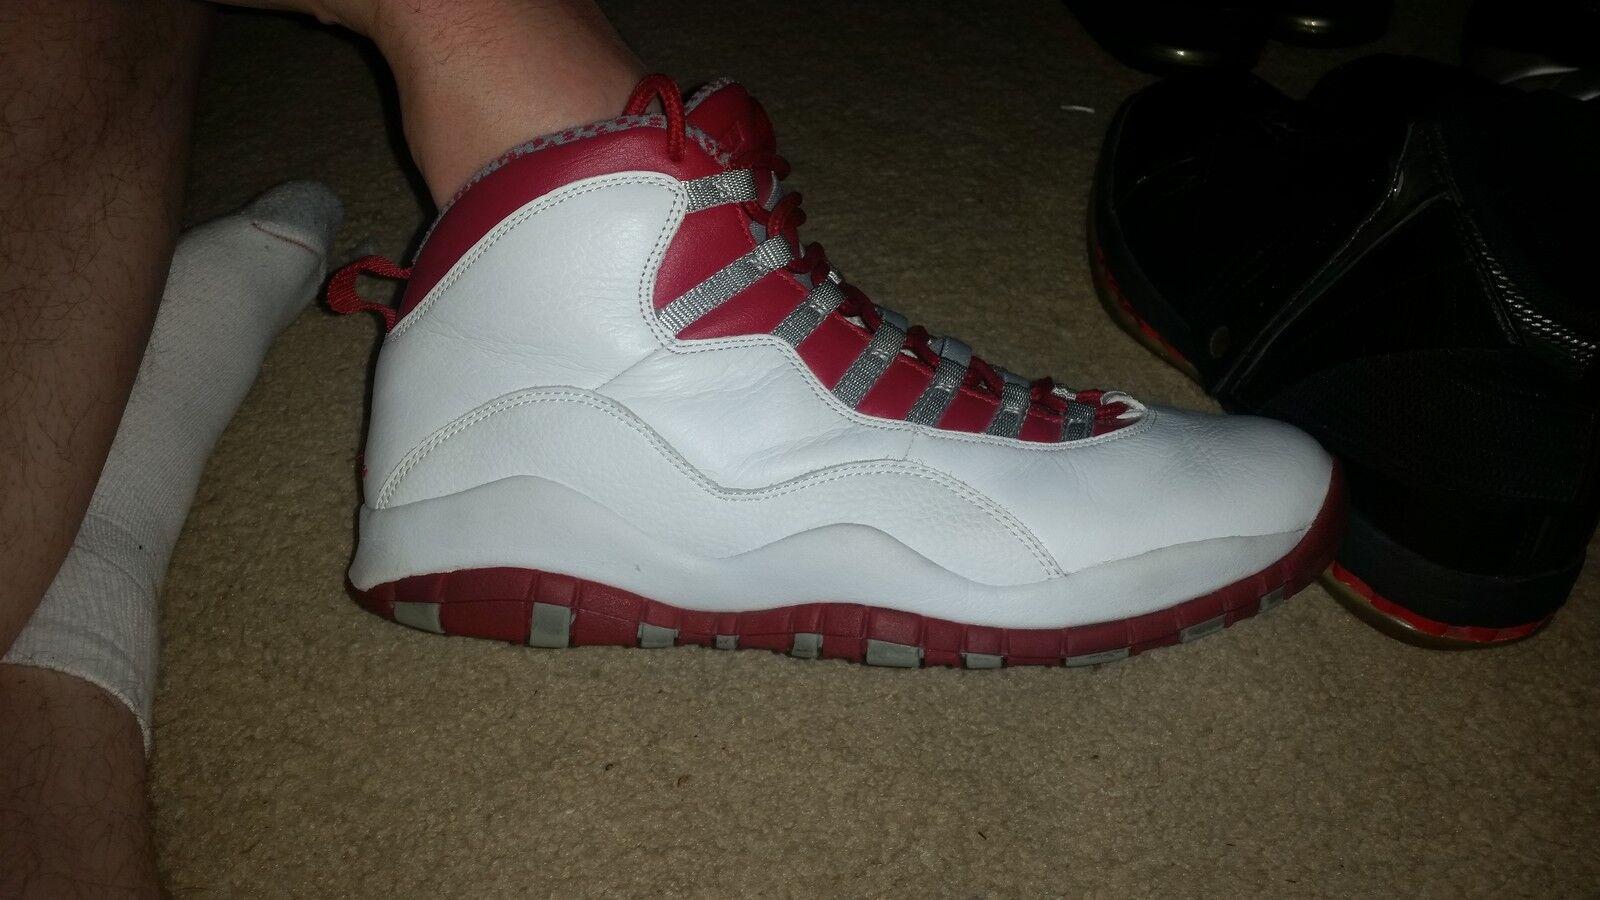 Air Jordan 10 Retro White Red 310805 161 Basketball Shoes US 12 Brand discount